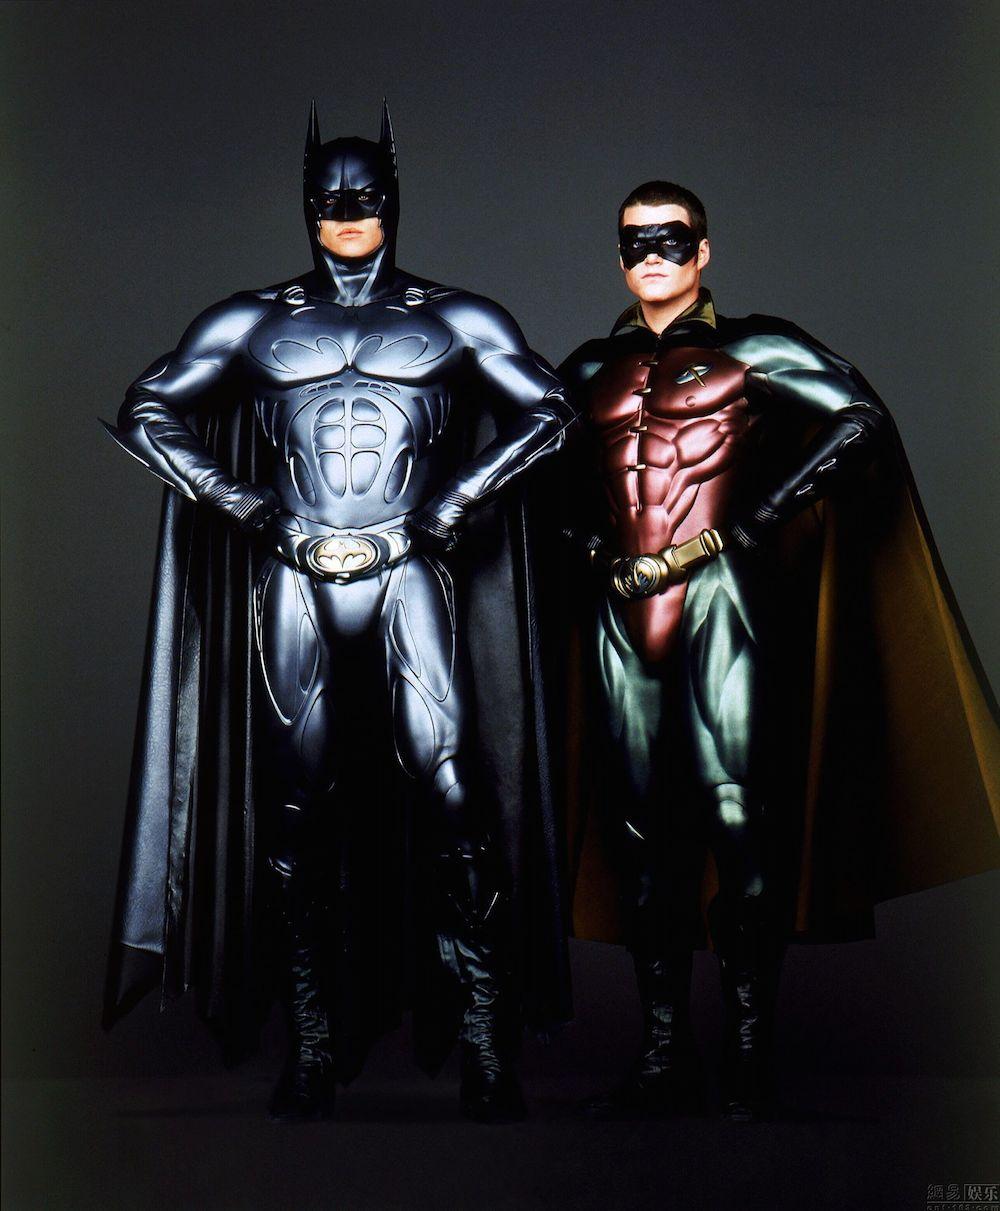 Val Kilmer's batsuit